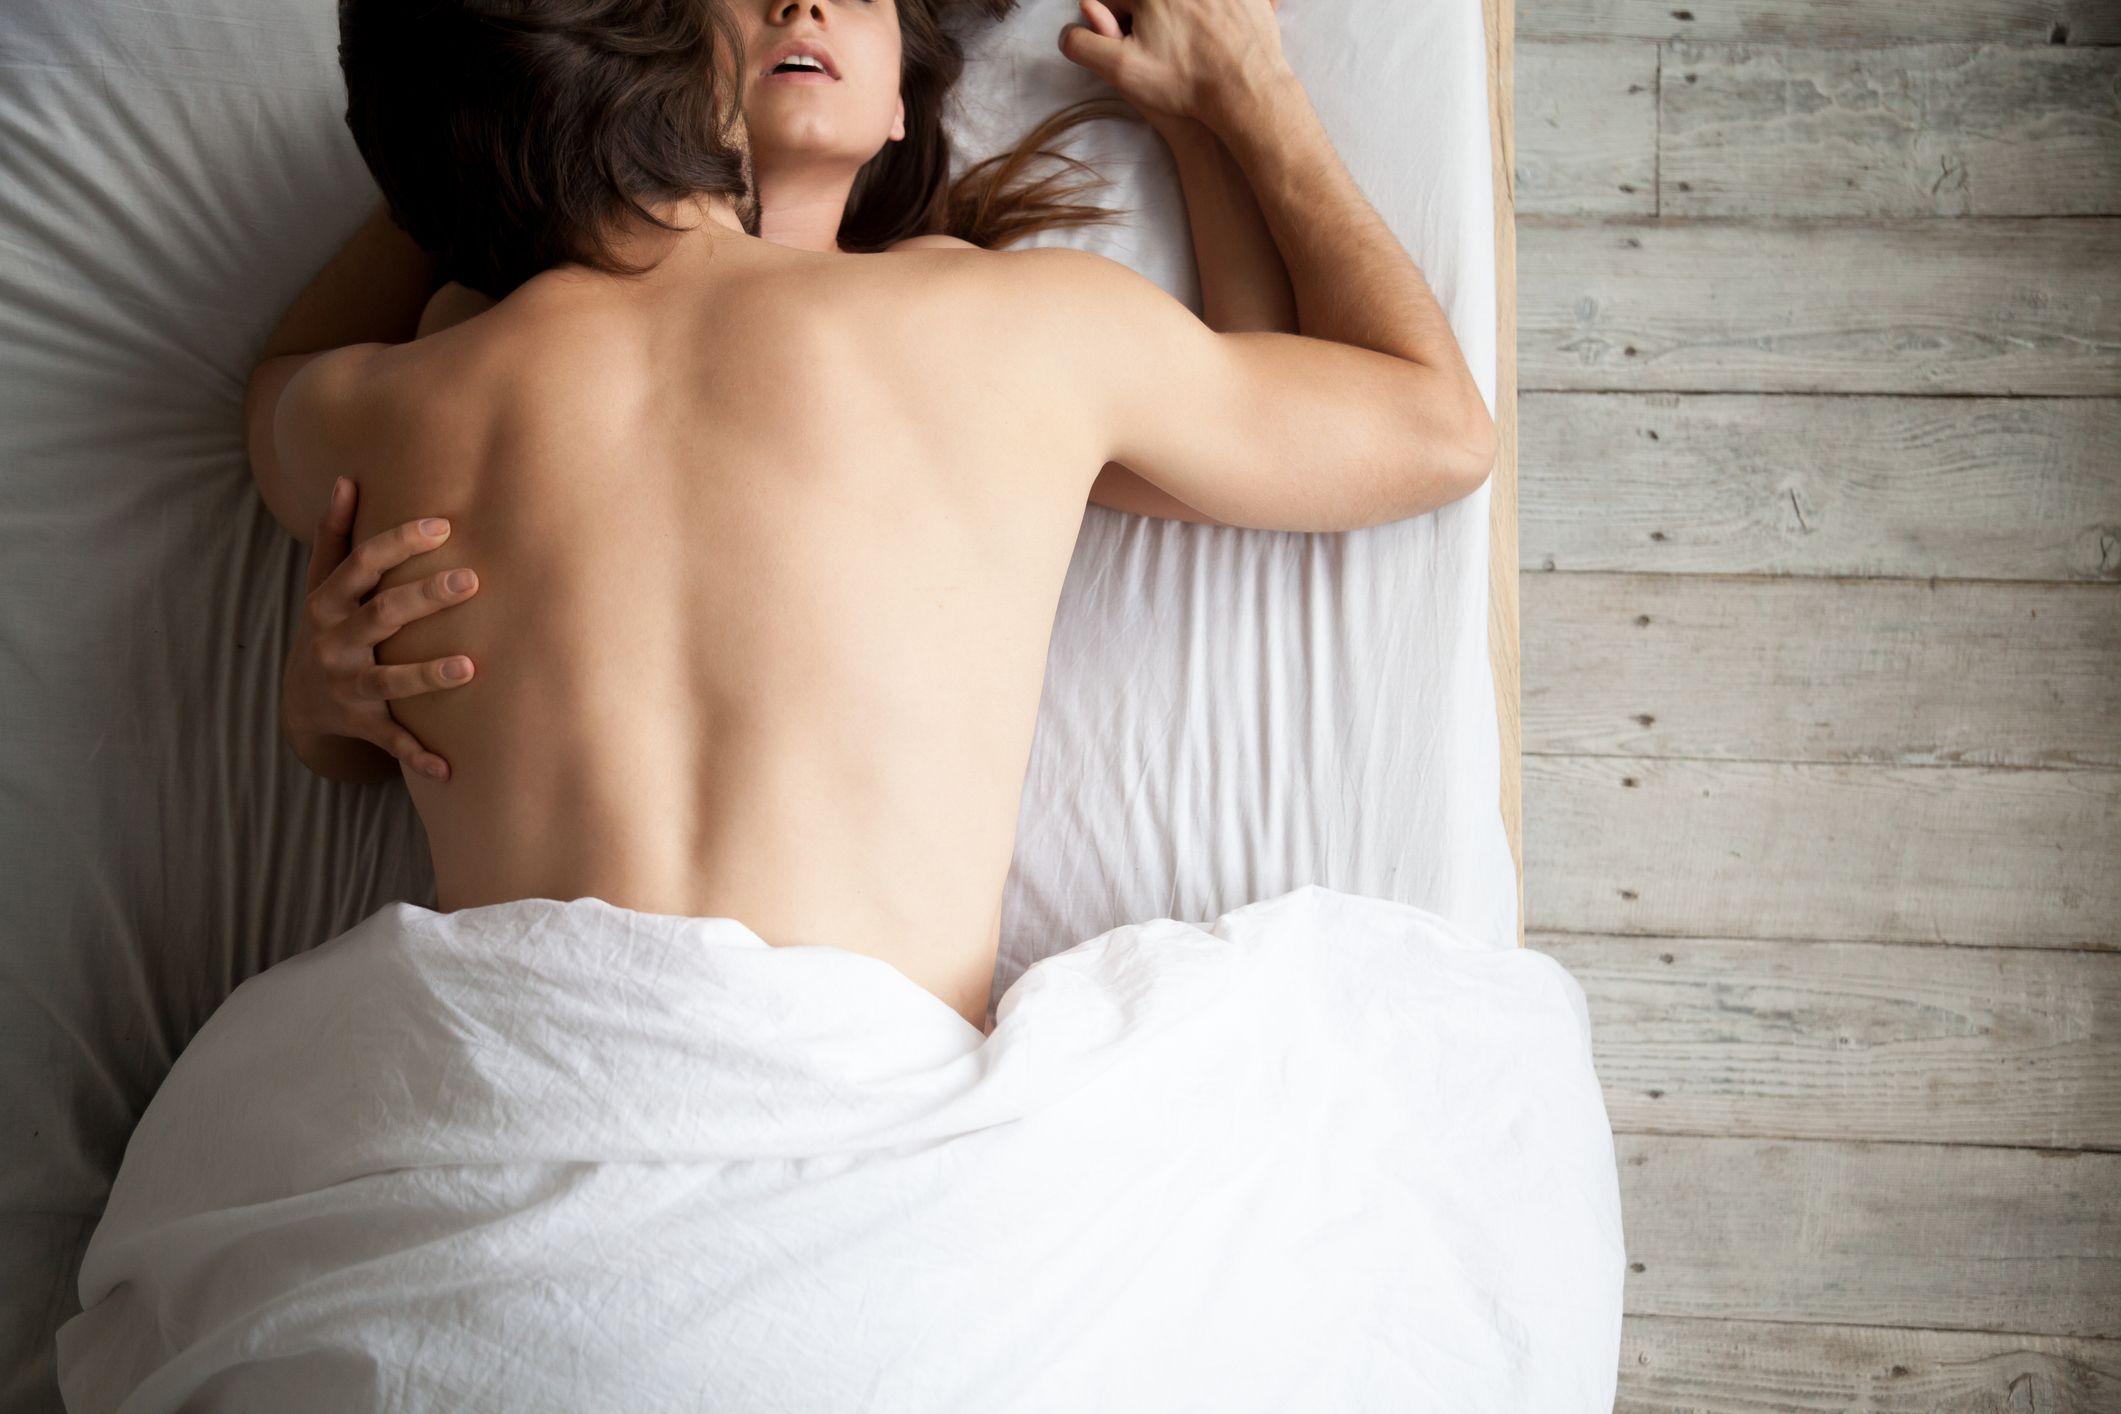 Missionary Sex Pics